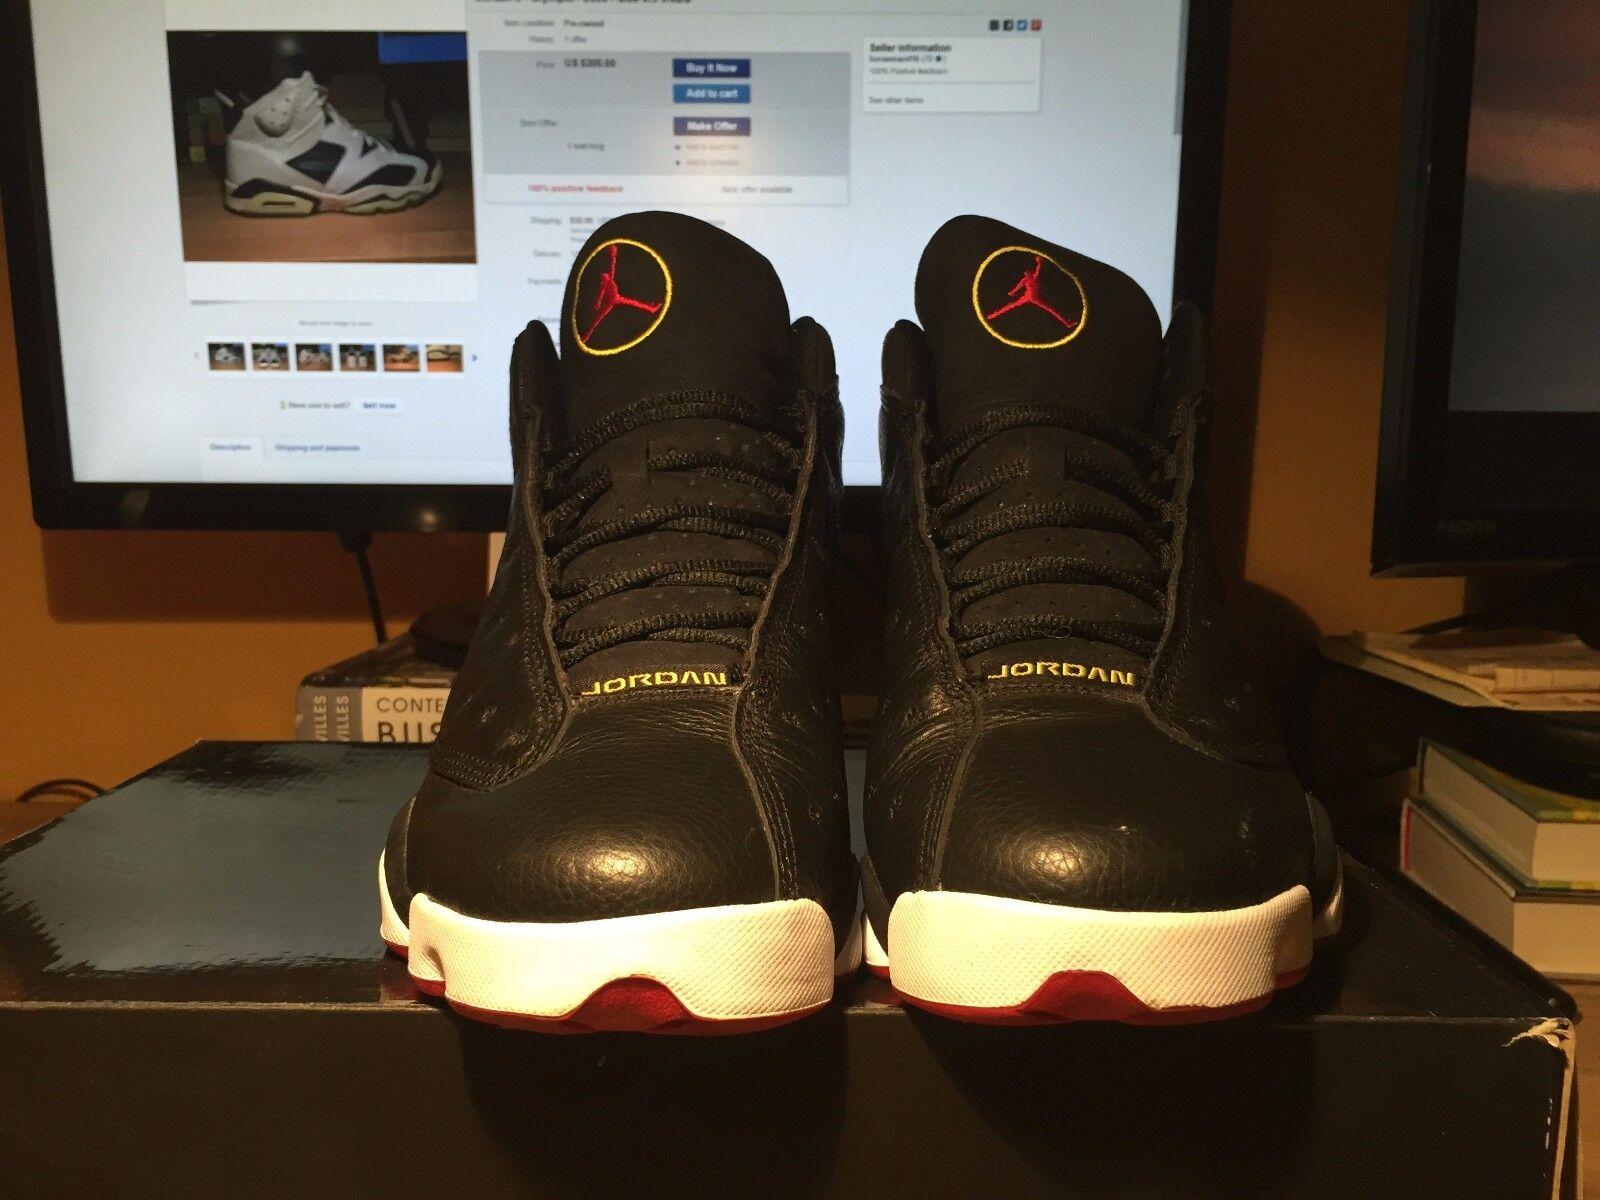 big sale b0ac4 aae11 ... Nike Air Jordan 13 Retro (Playoff) - - - Size 10.5 b0e584 ...